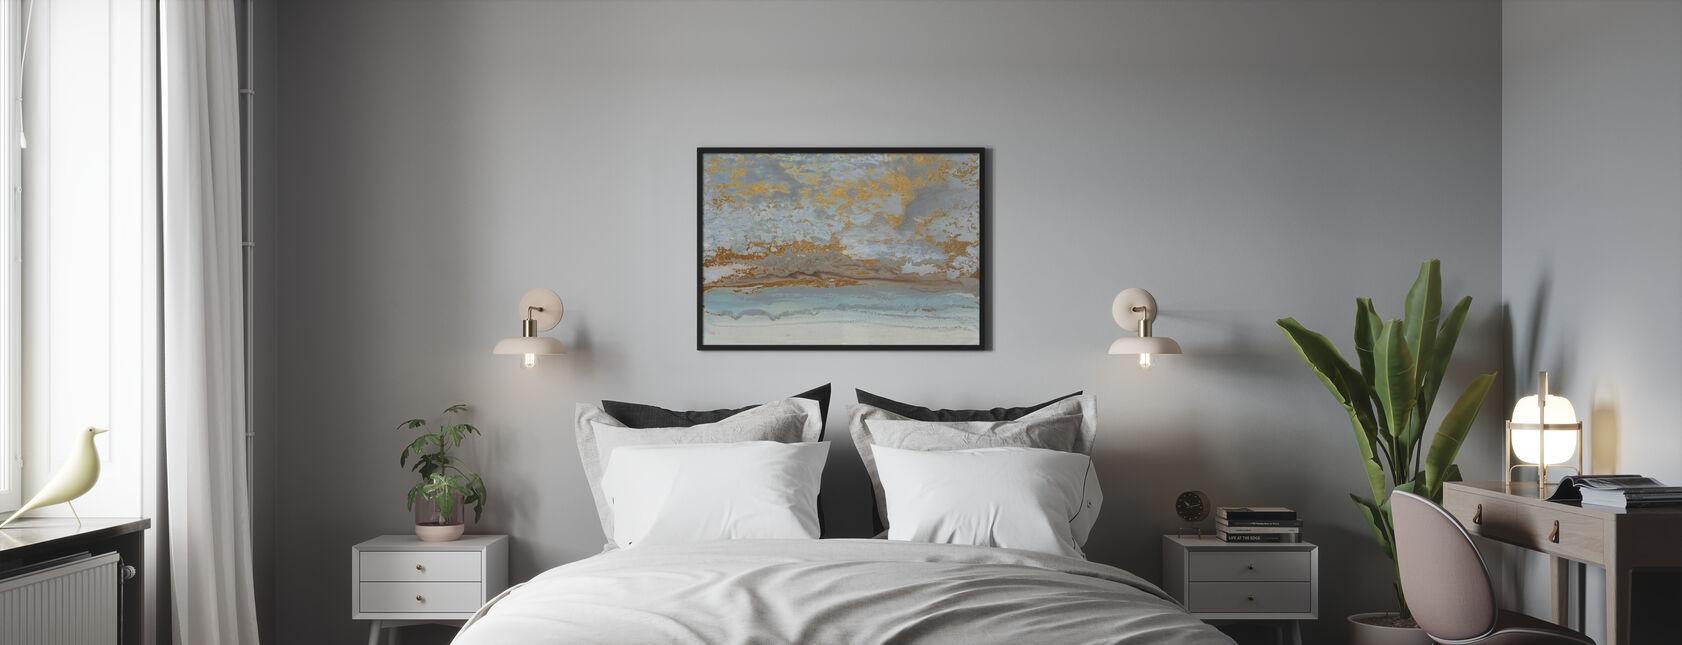 Wind Swept - Poster - Bedroom